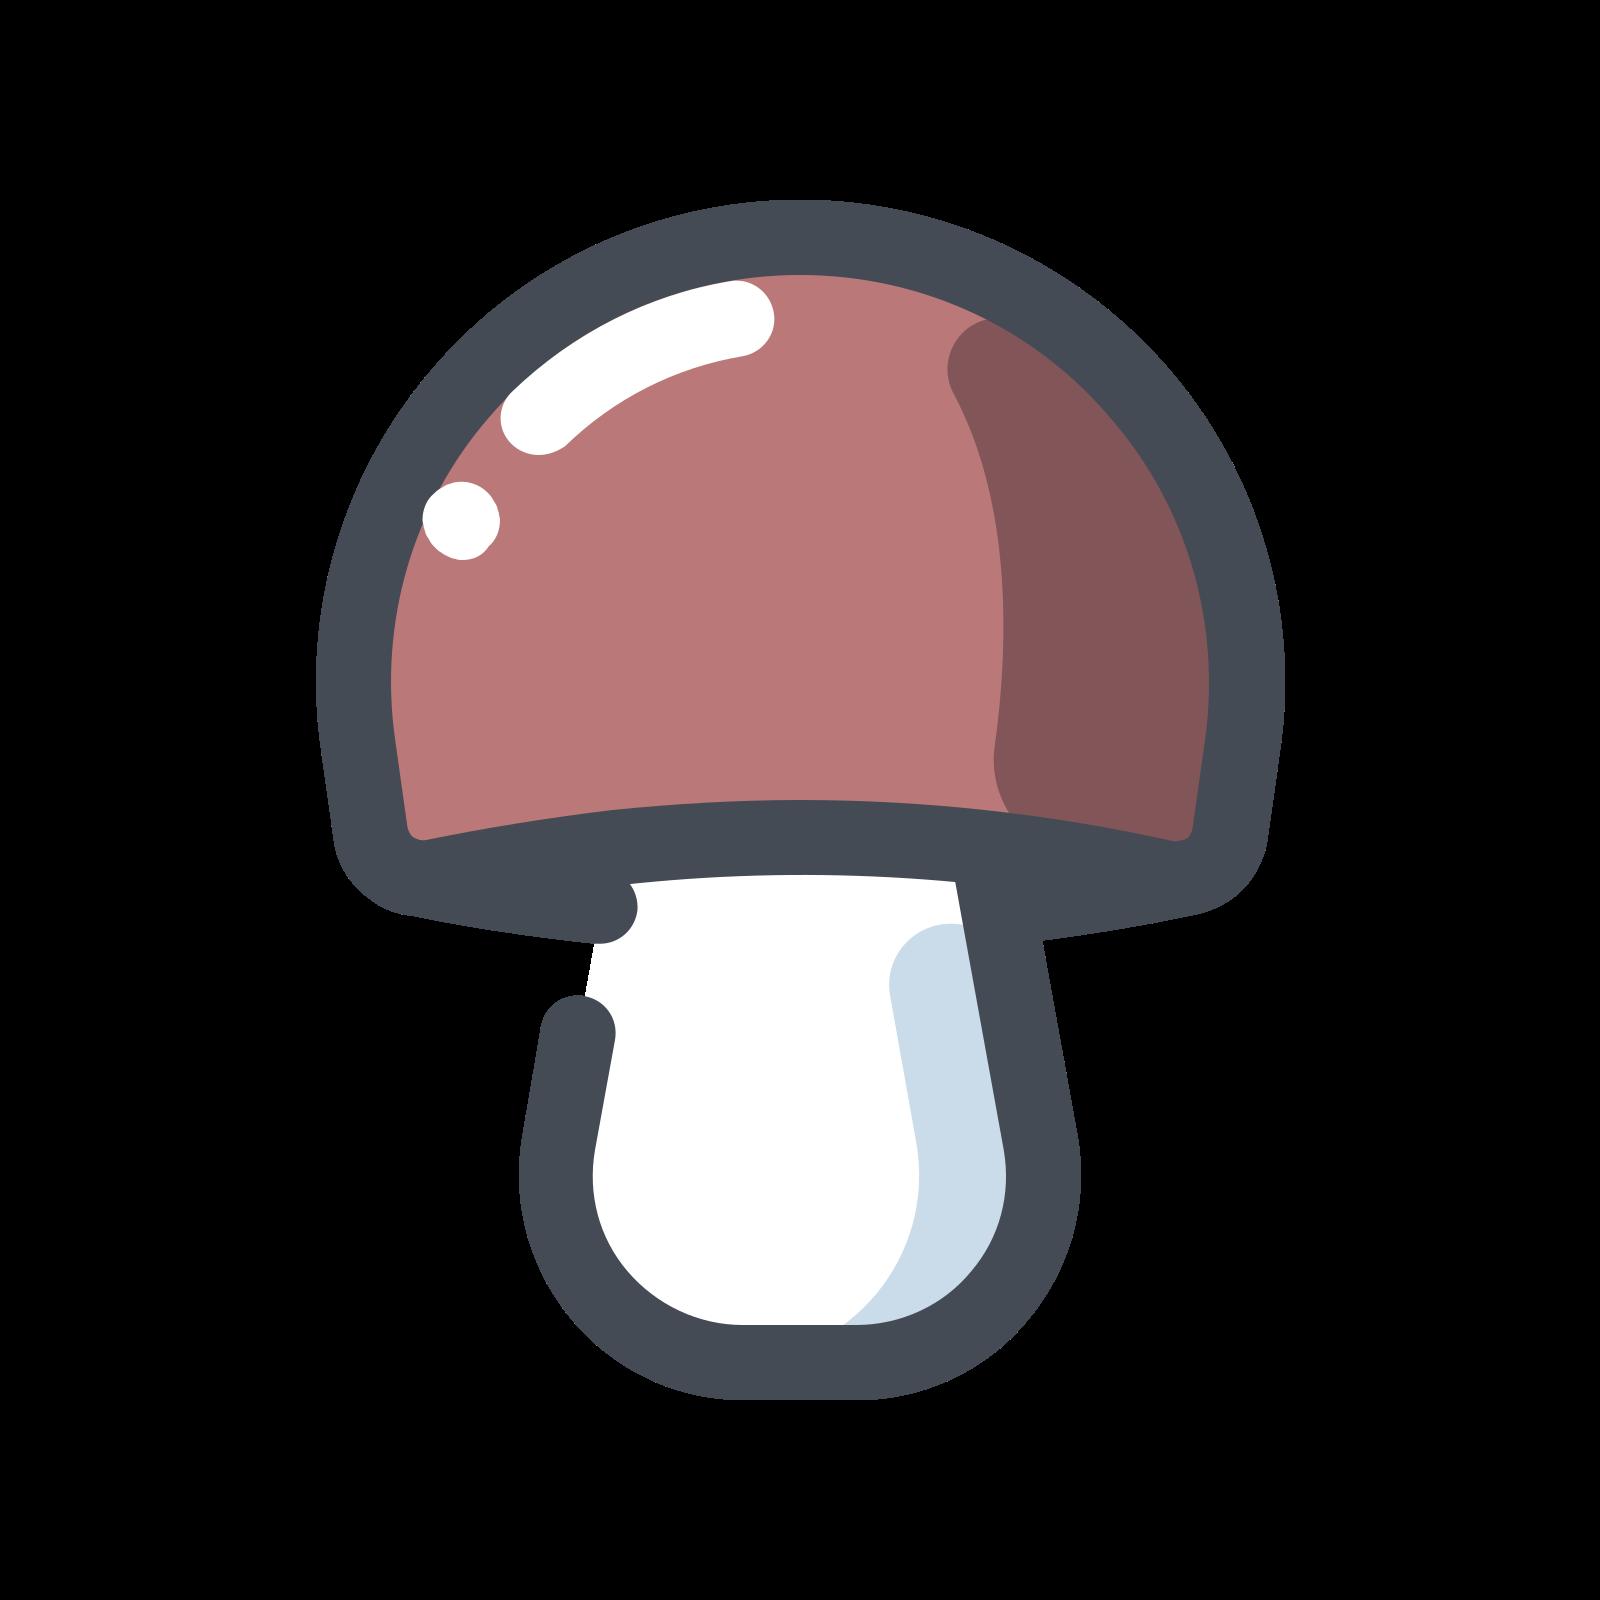 Boletus Mashroom icon